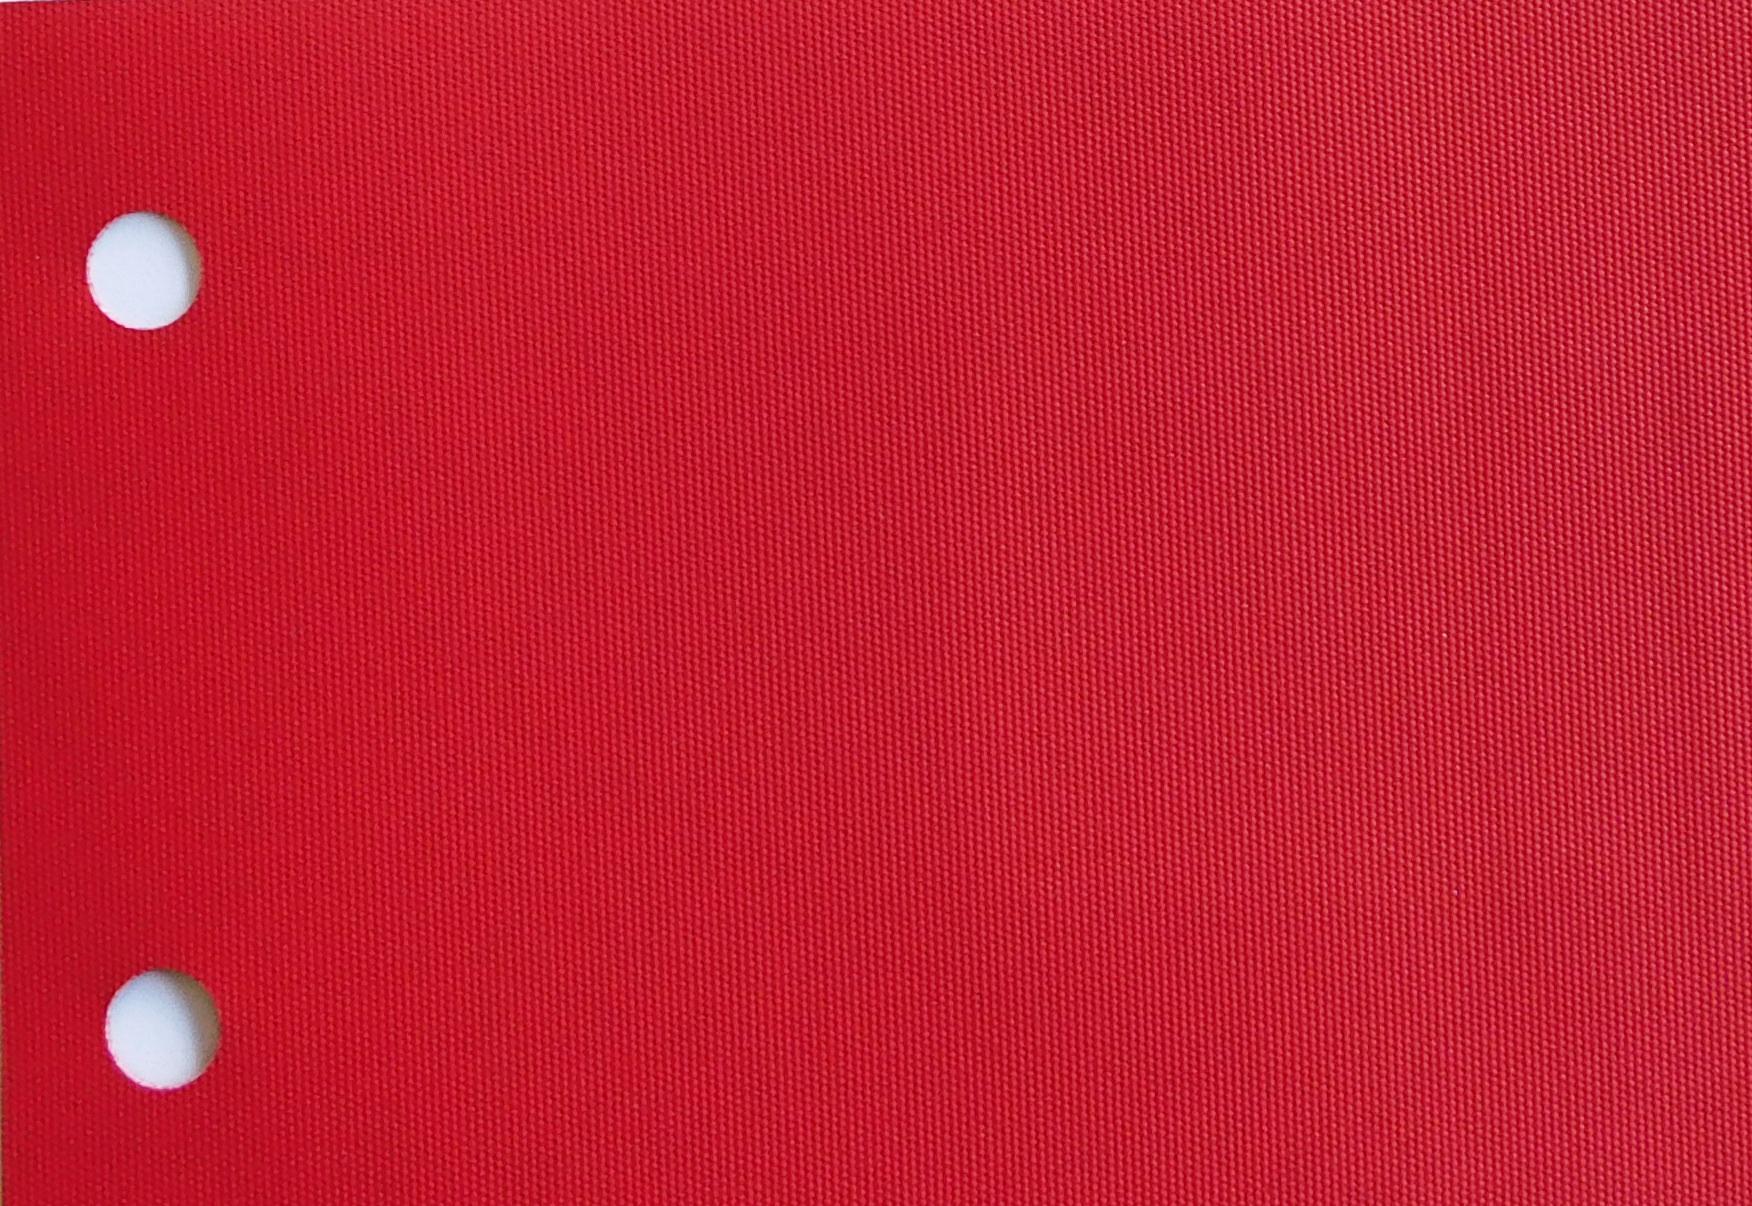 Vitra Flame Blind fabric